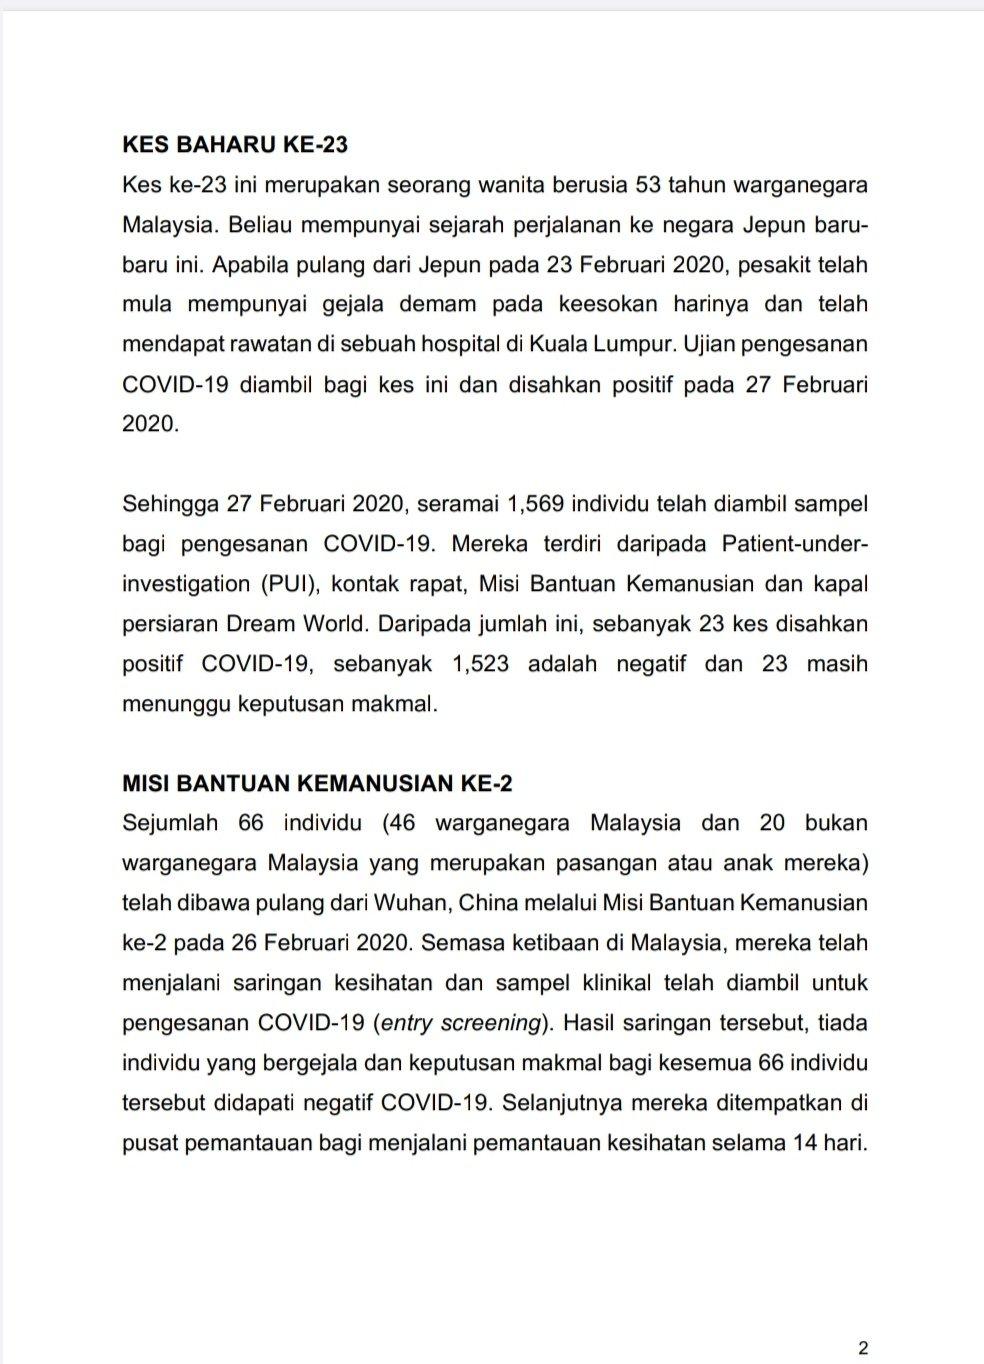 Malaysia Baru Nak Bebas Koronavirus, Namun Wanita Baru Balik Jepun Bawa Wabak